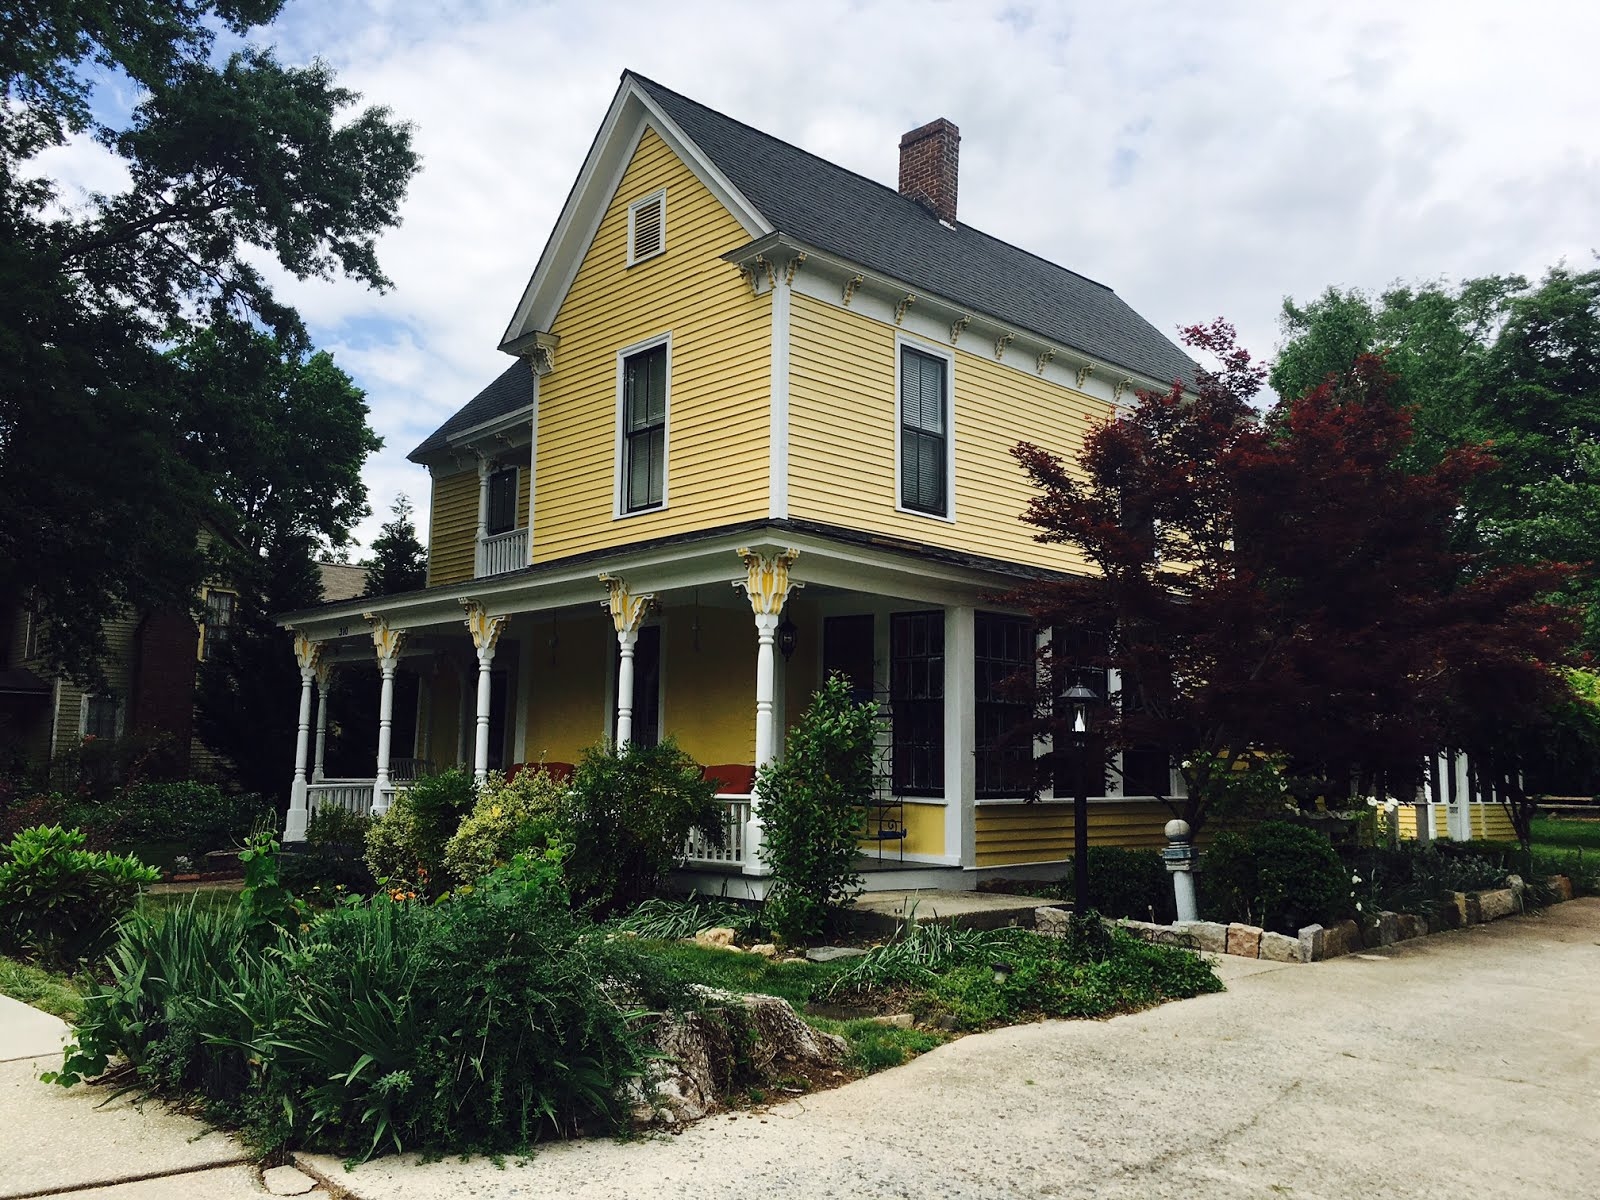 310 E. Bank Street, Salisbury NC 28144 ~ circa 1895 ~ $254,000